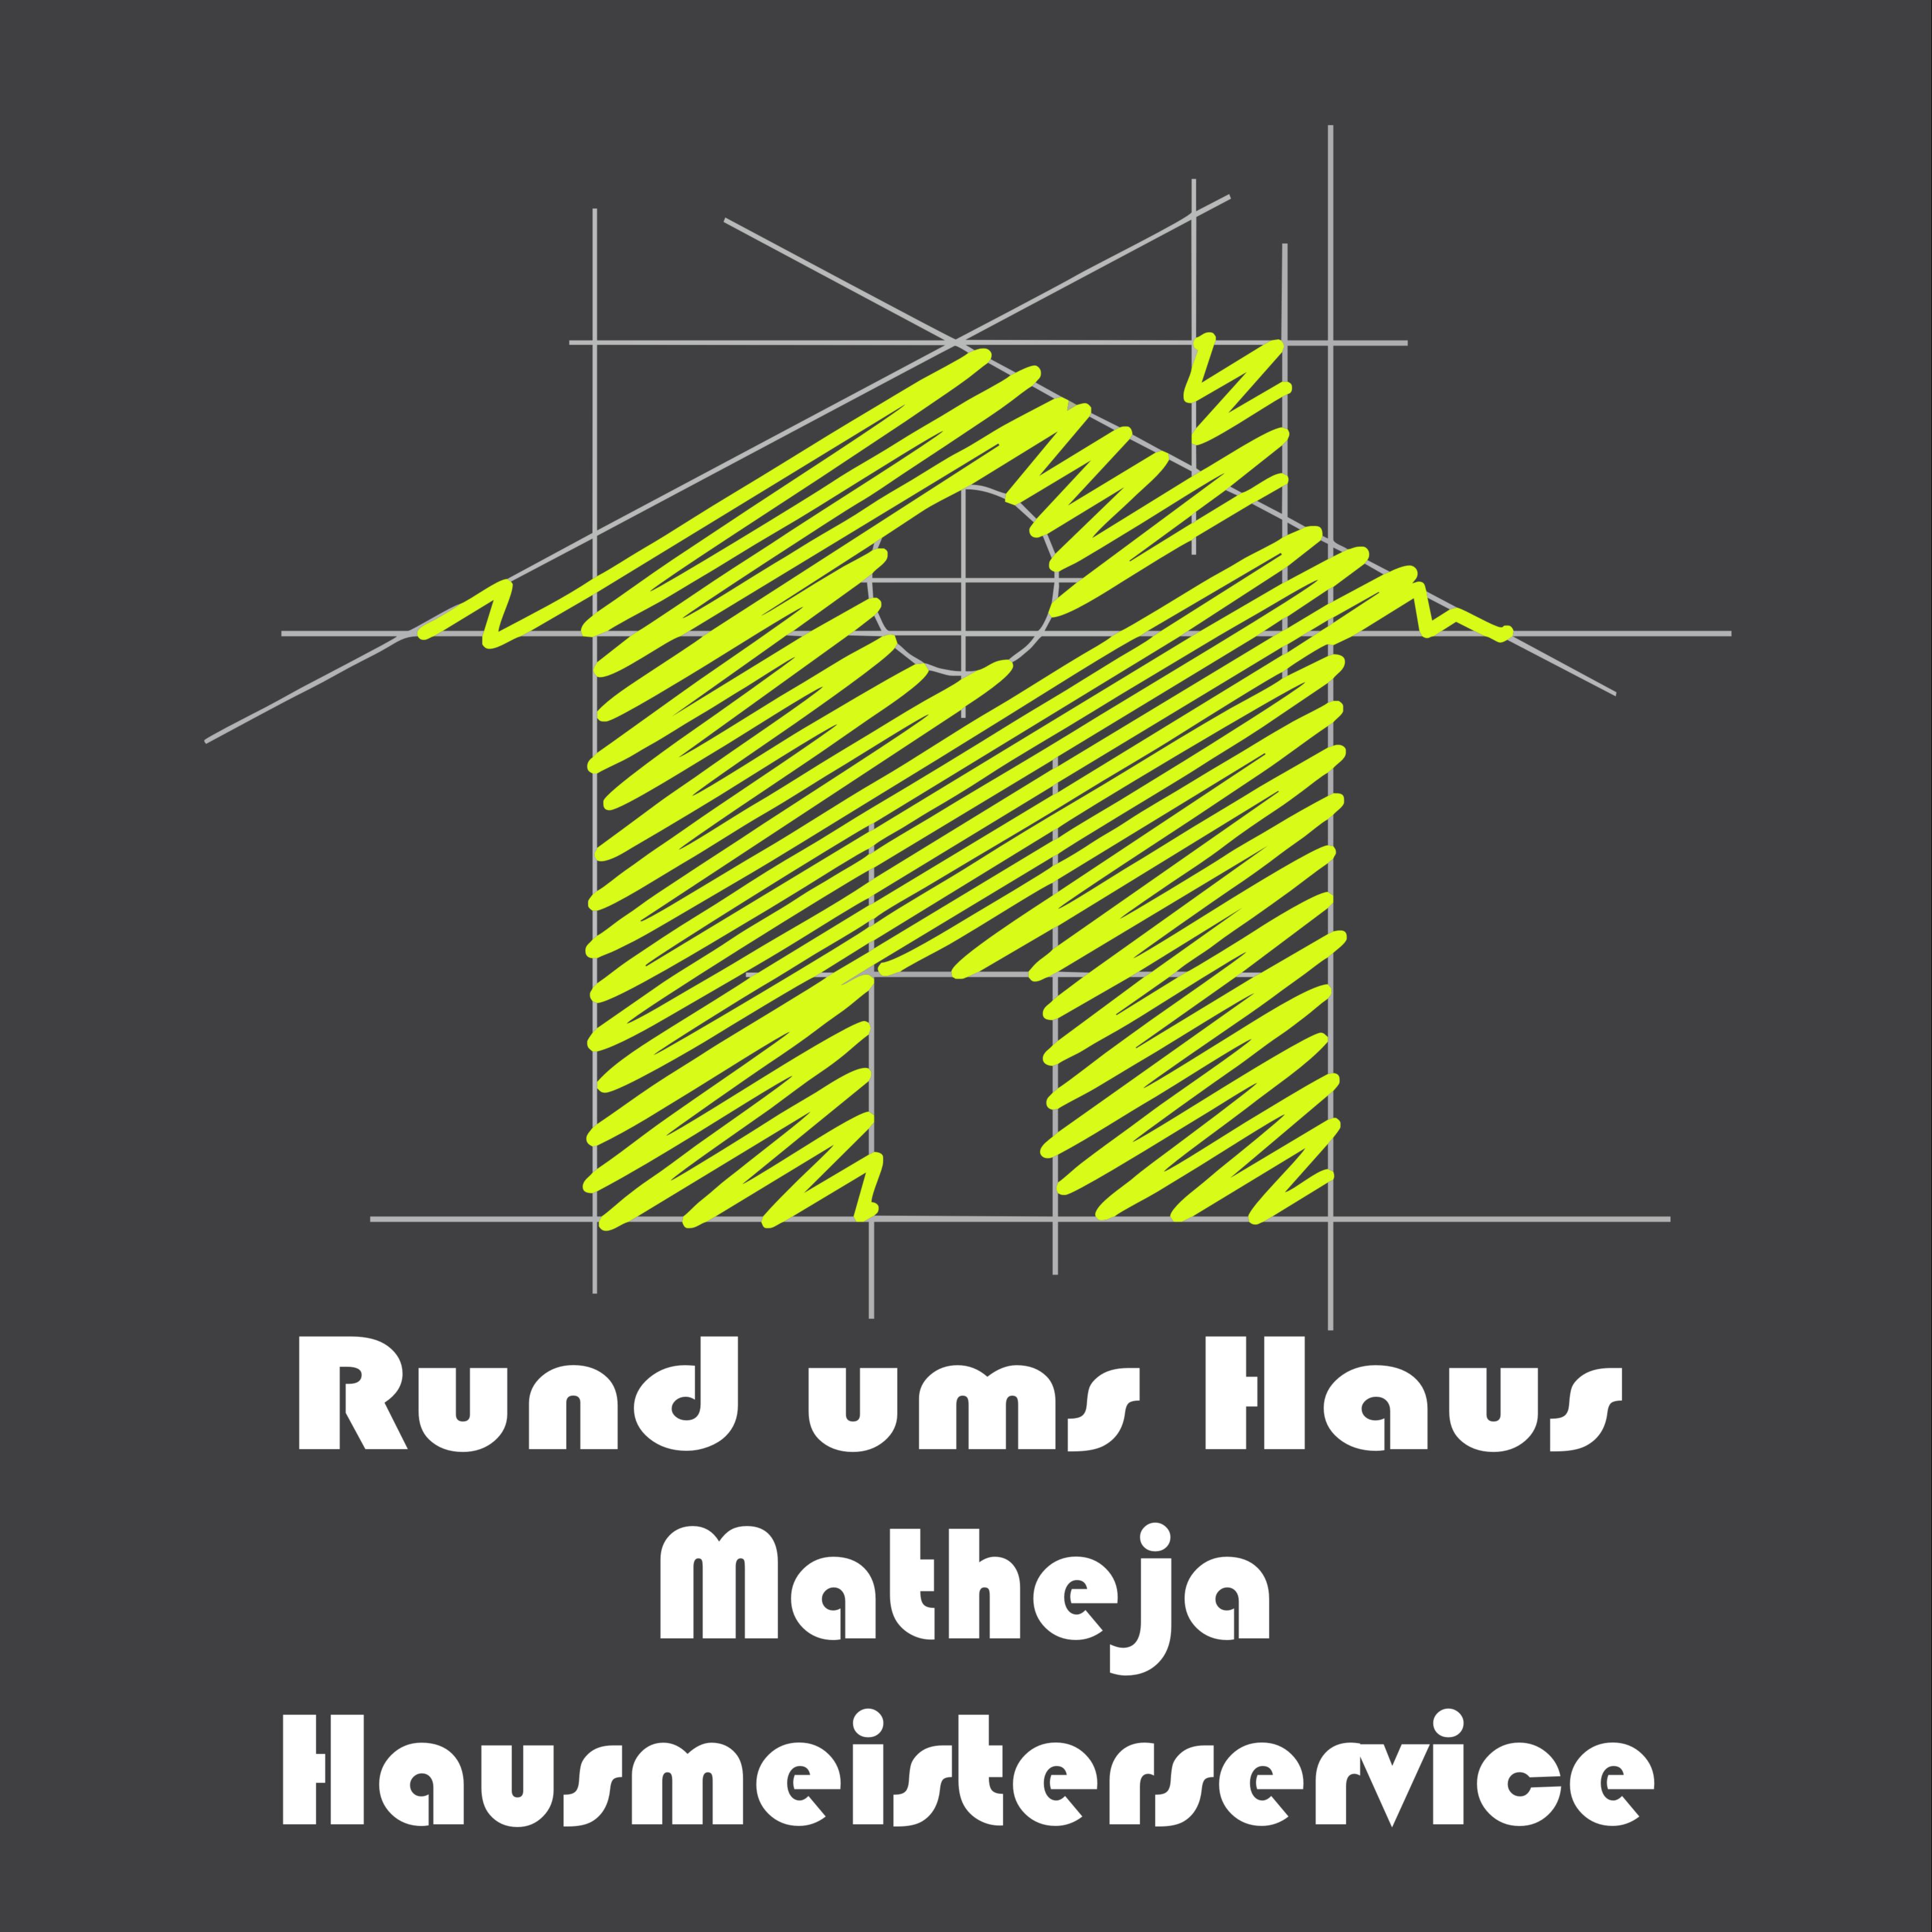 Logo von Innenausbau Matheja Bau